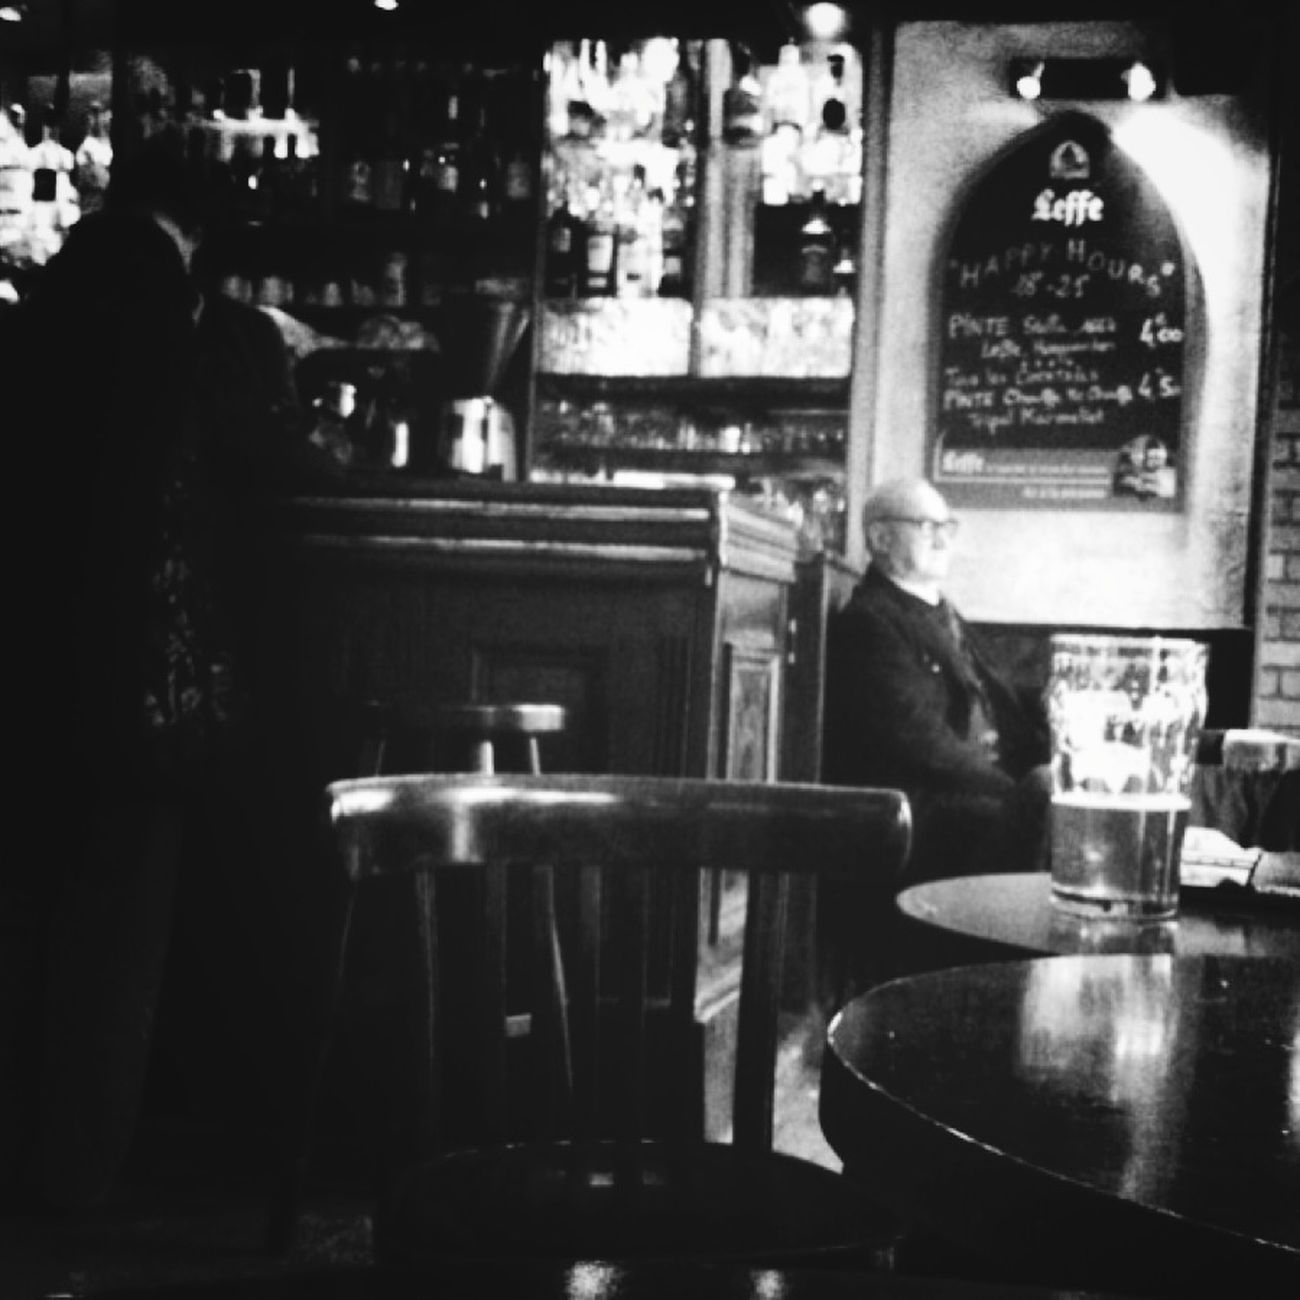 Streetphotography Blackandwhite BNW PARIS Troquet Parisien